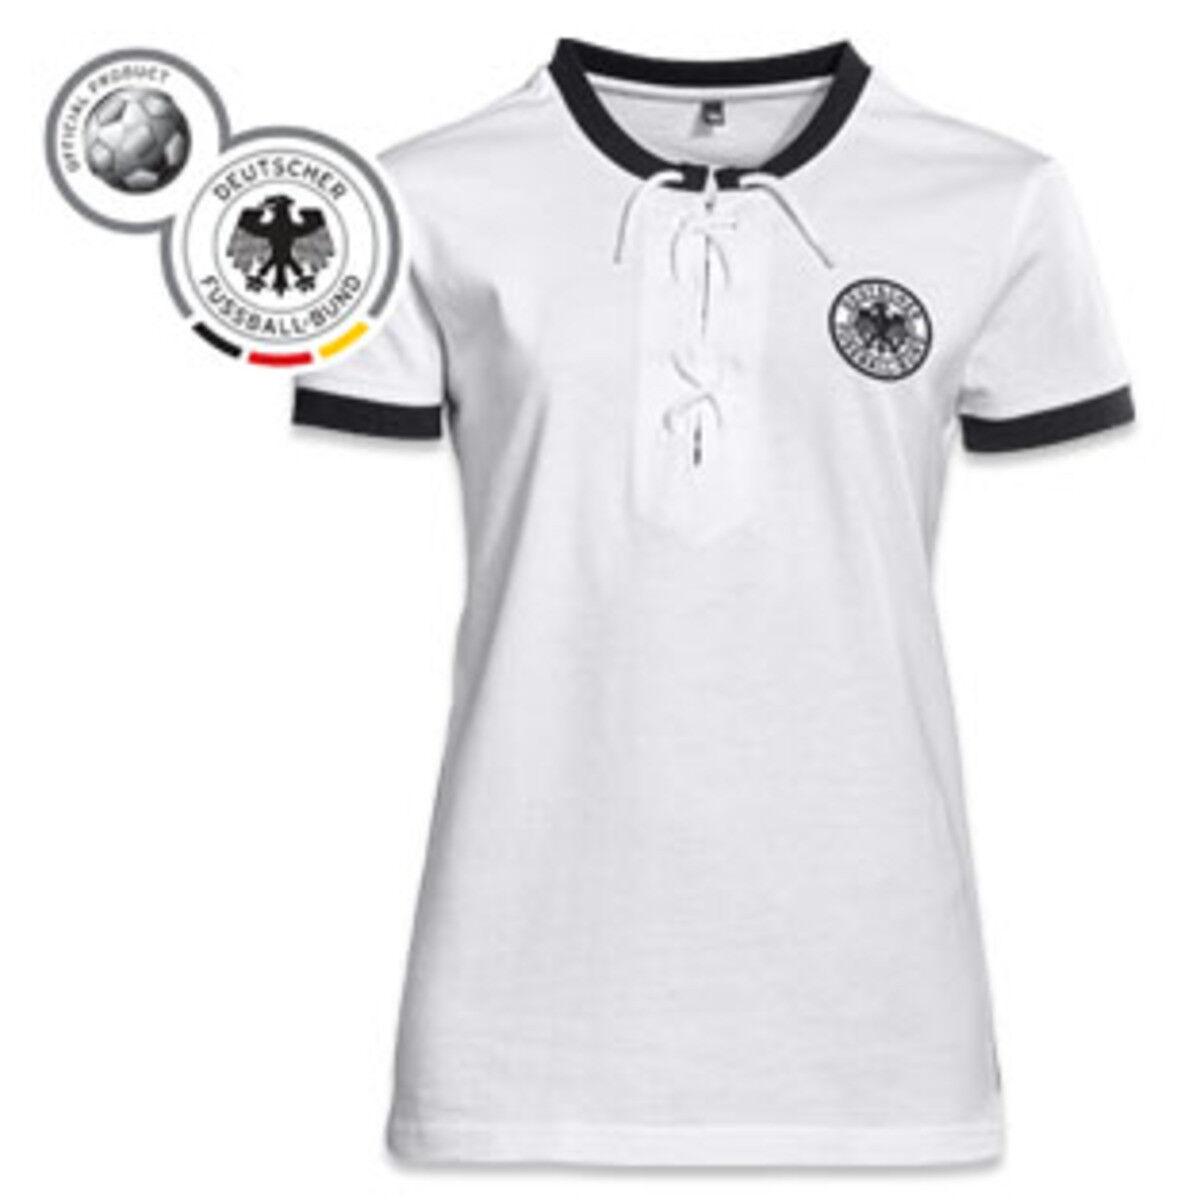 Konvolut 4 x DFB Retro Trikot Shirt 1954 Gr. S XL nach Wahl